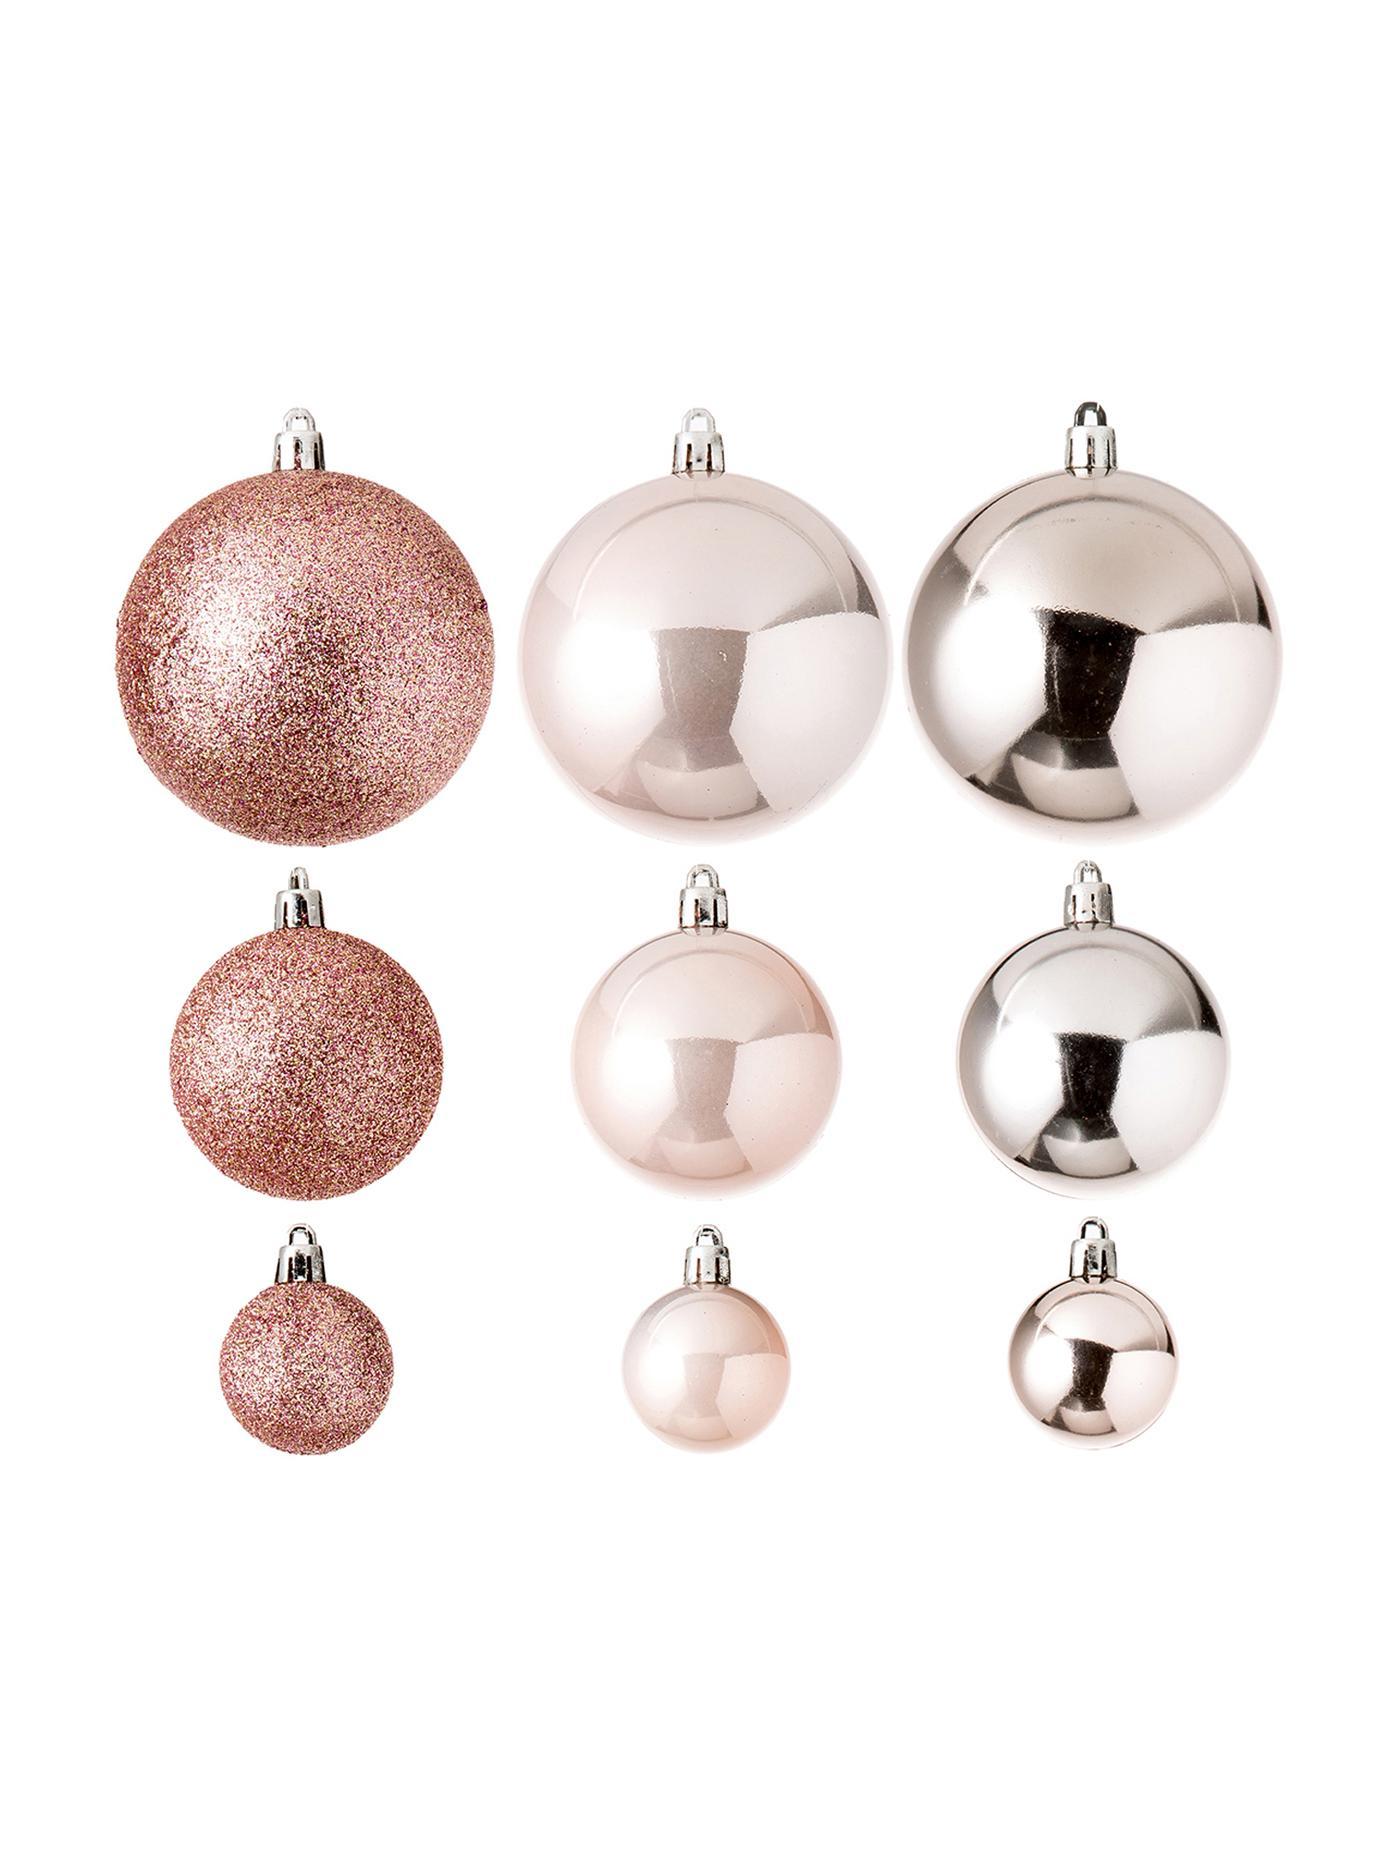 Weihnachtskugel-Set Silvia, 46-tlg., Kunststoff, Helles Rosa, Sondergrößen